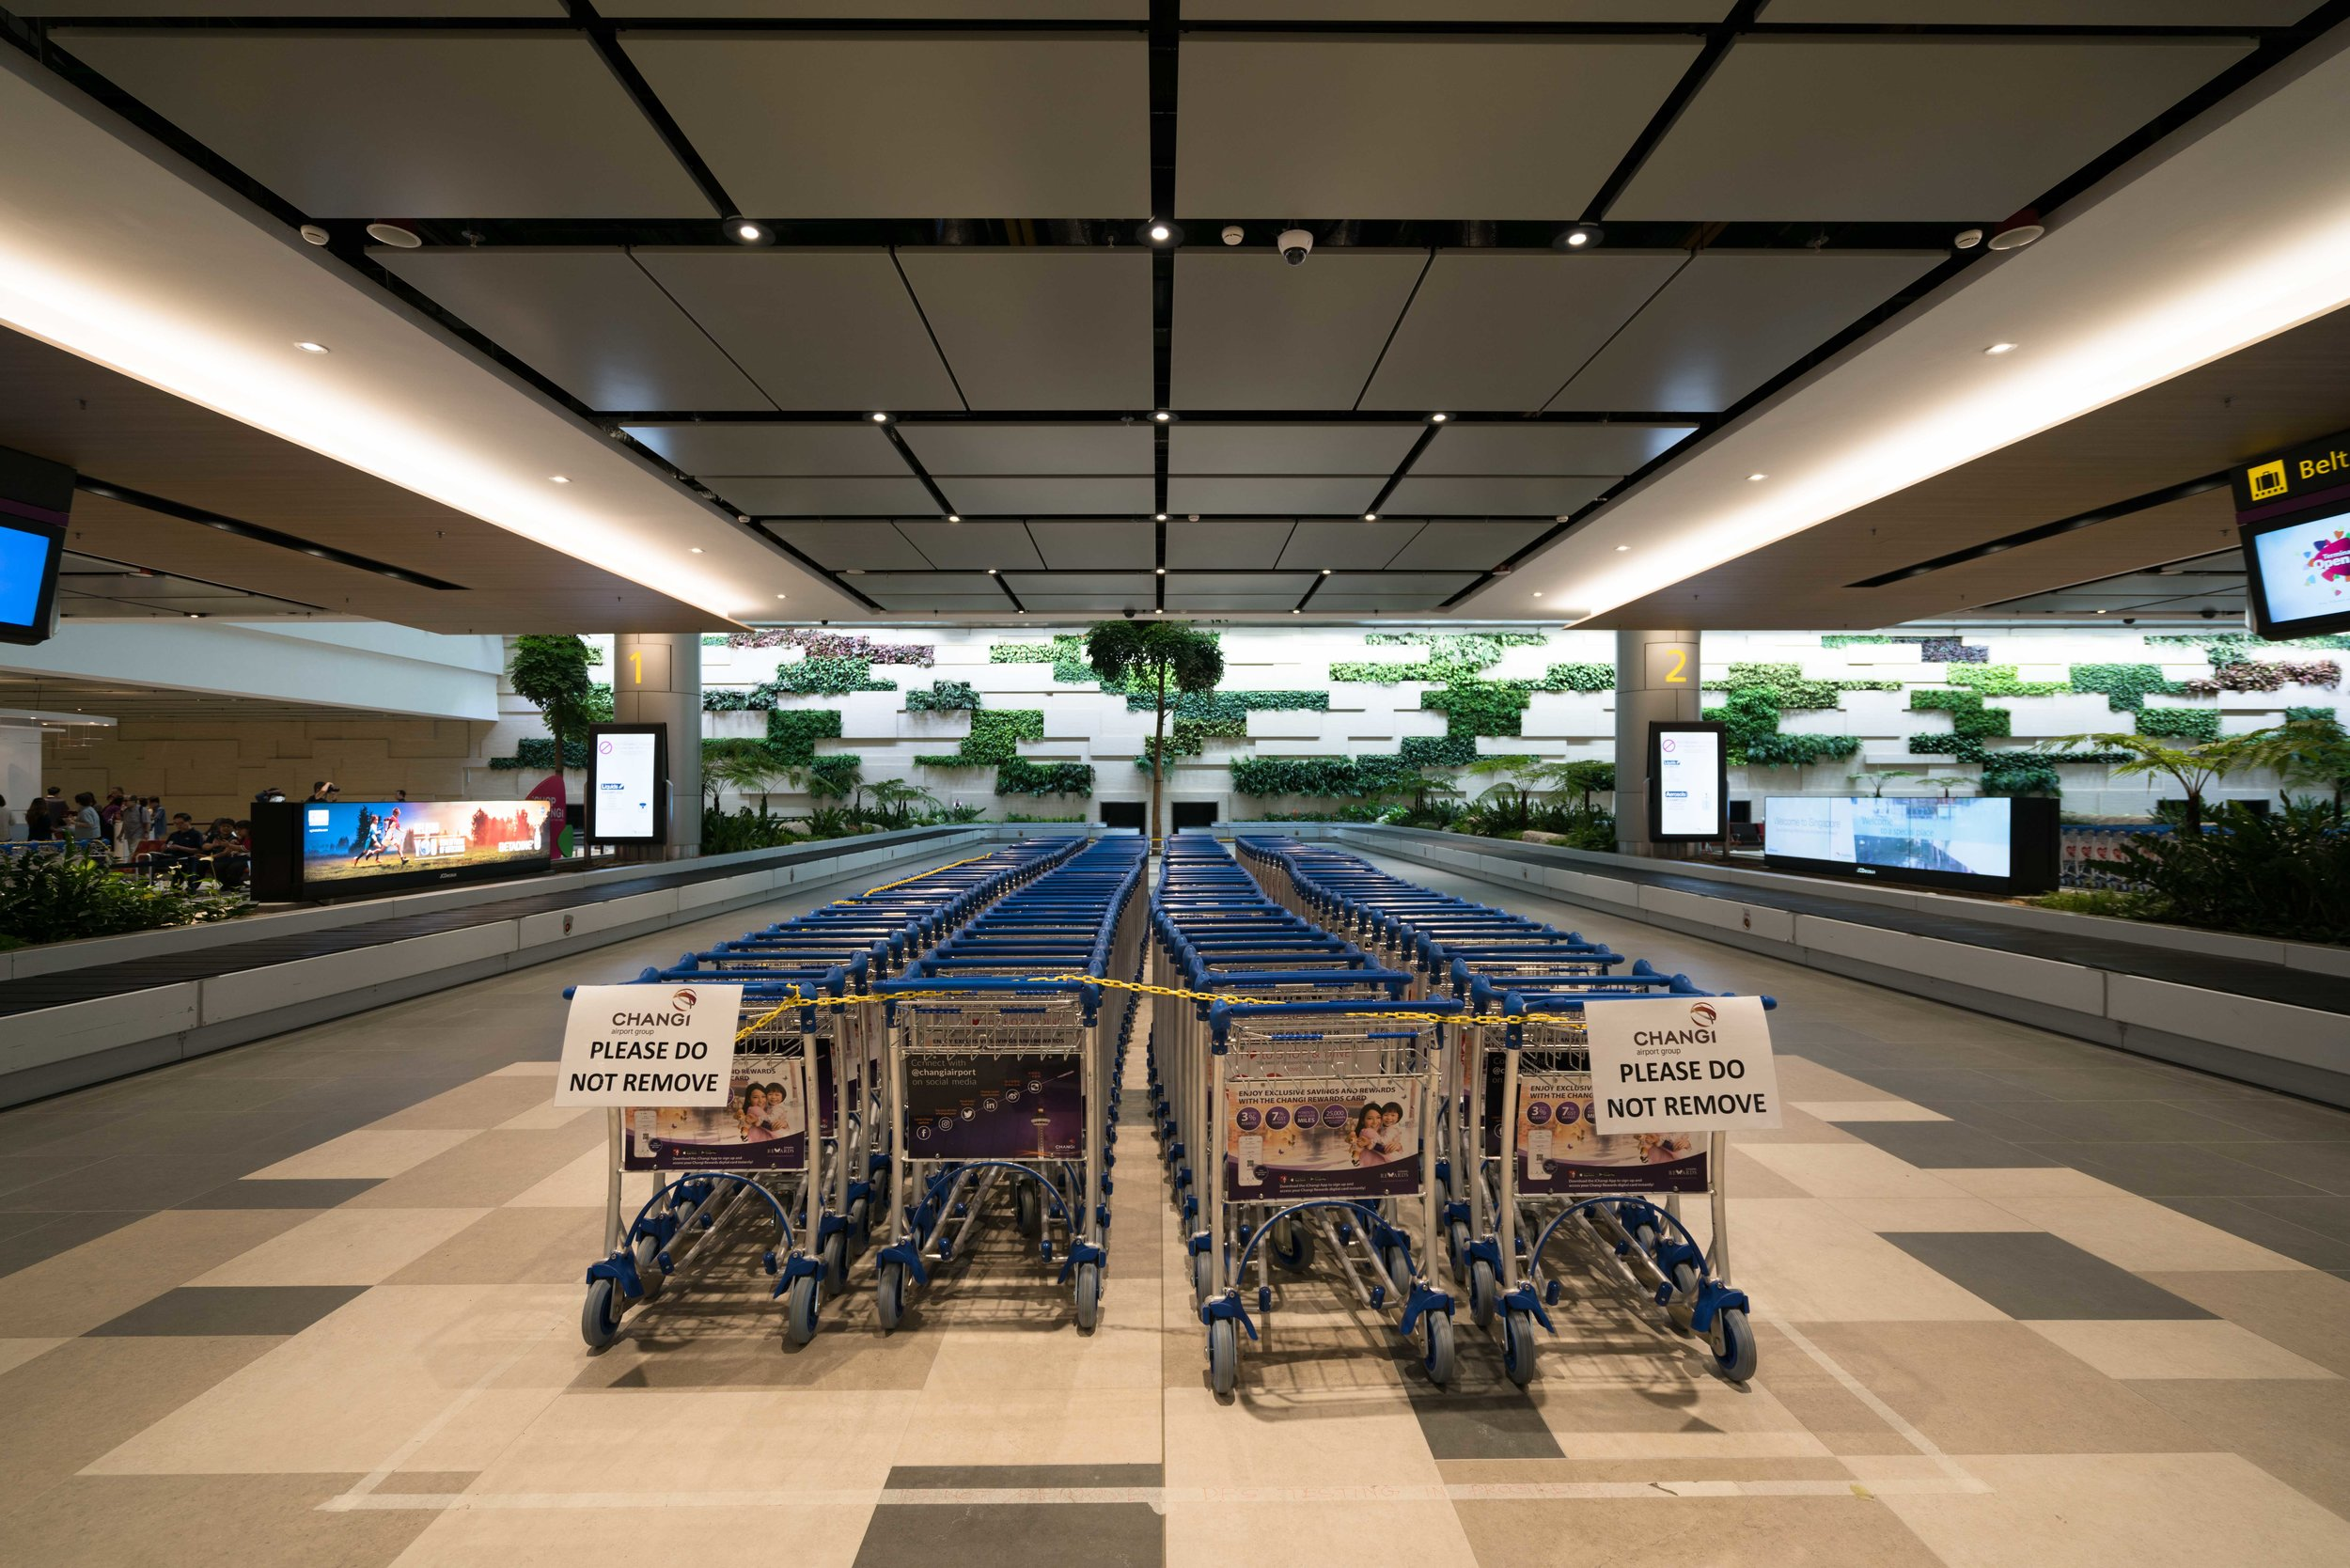 Changi-Airport-Terminal-4-18.jpg